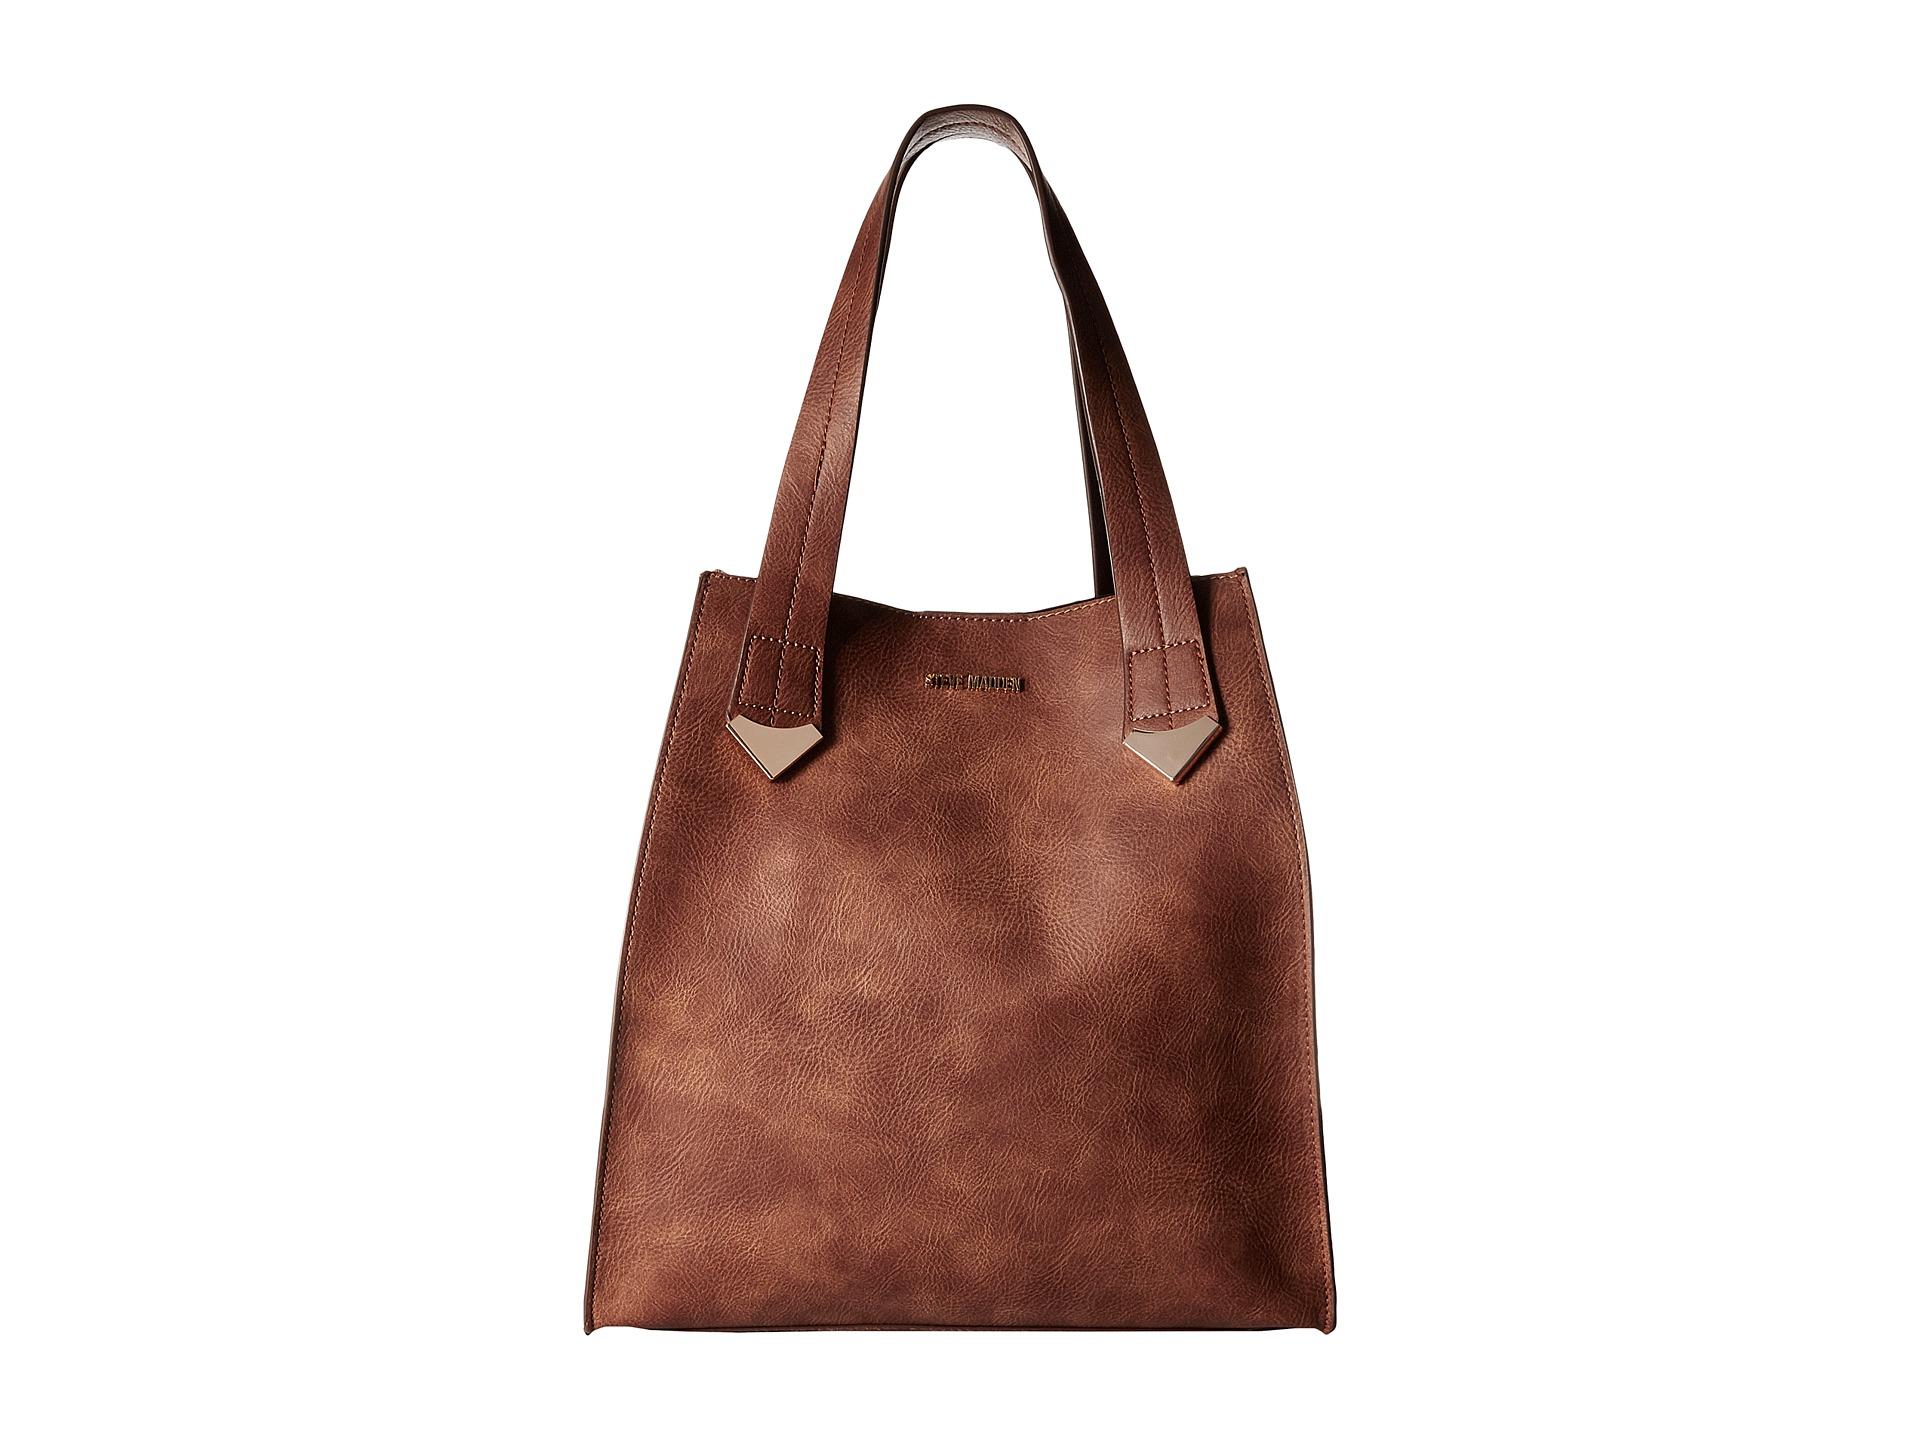 Samantha Brown Luggage Qvc: Steve Madden Brylee Large Tote Cognac